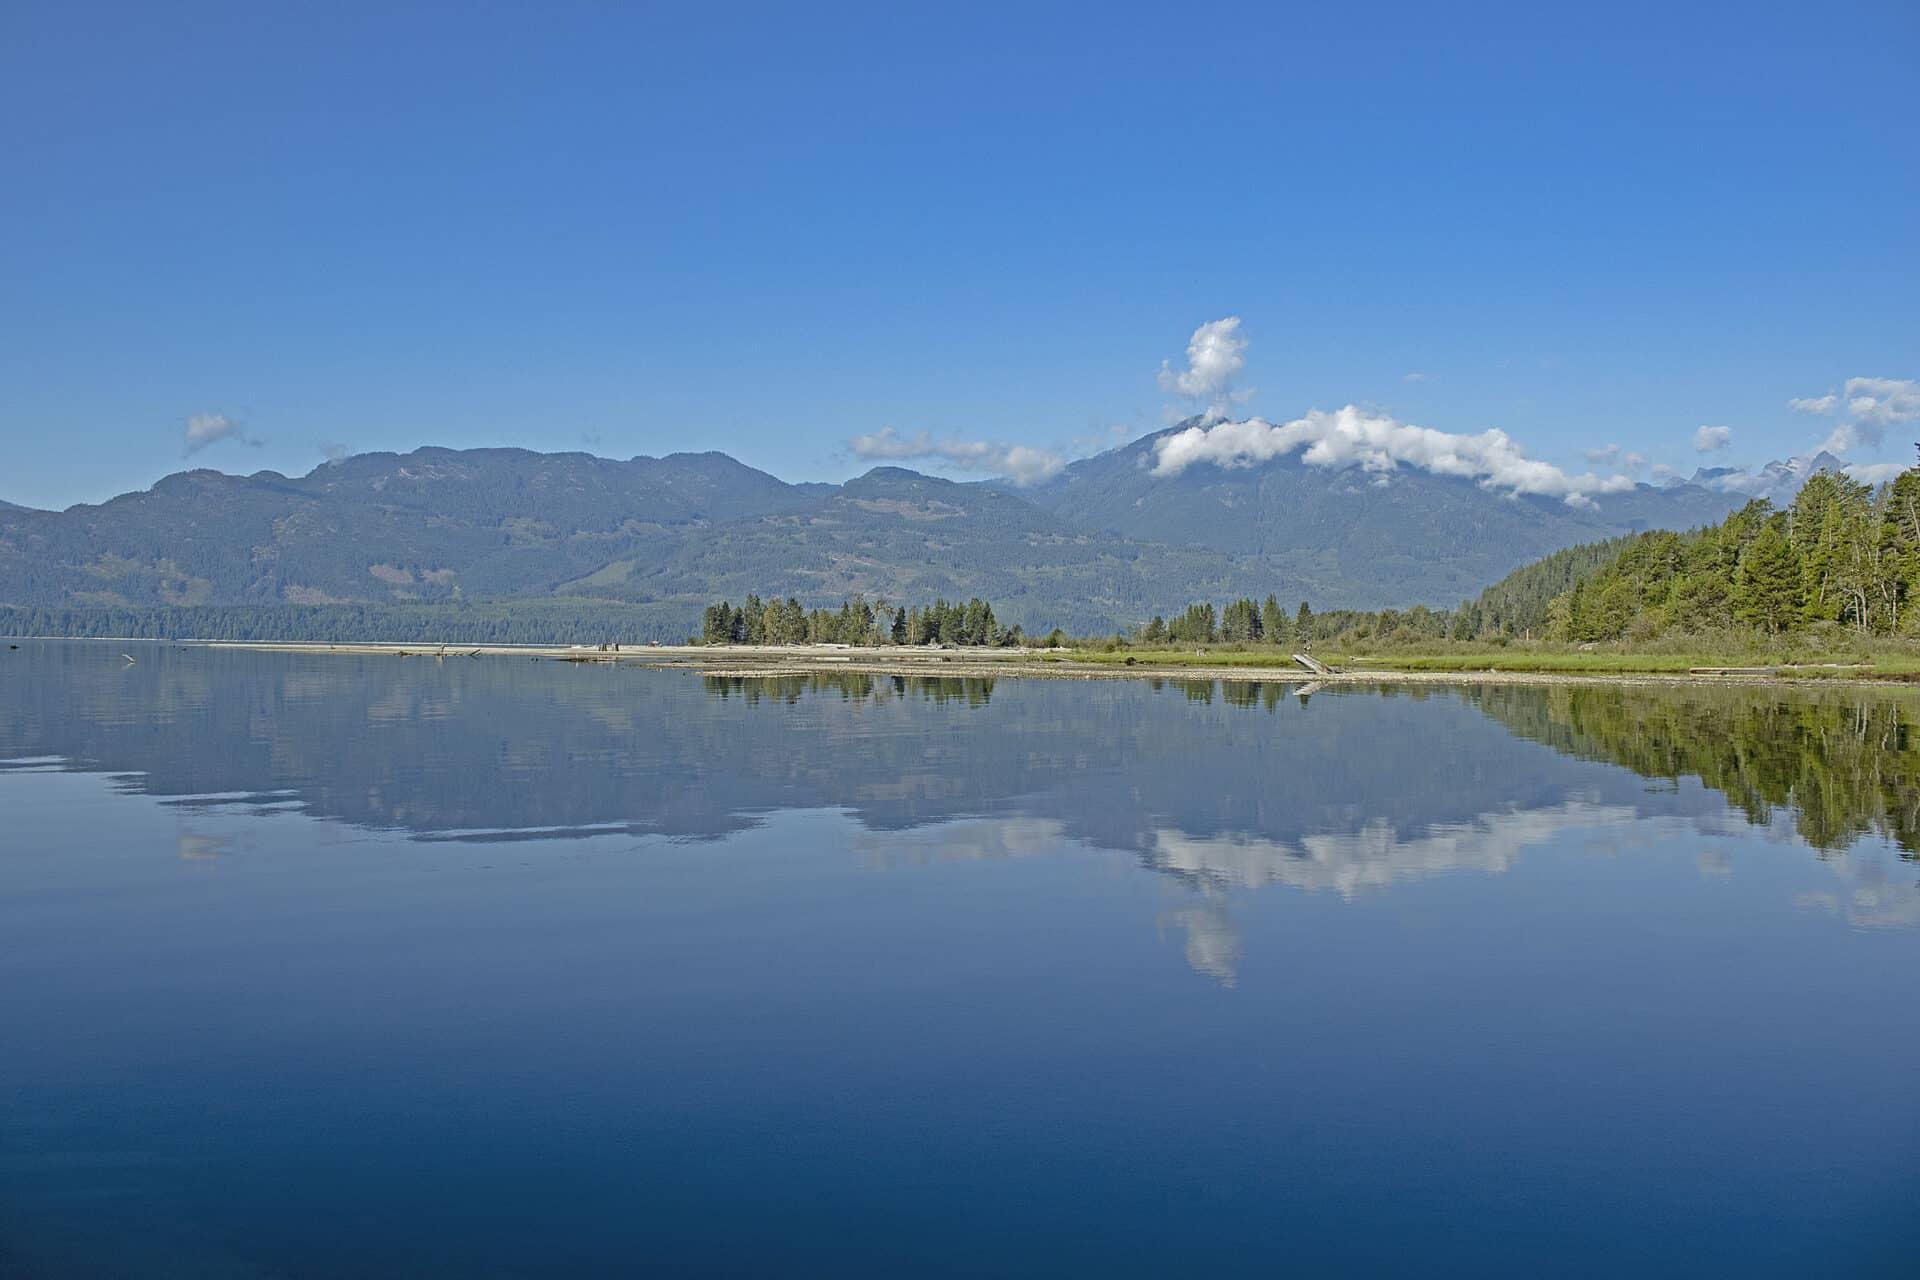 Harrison Lake, August 29, 2021